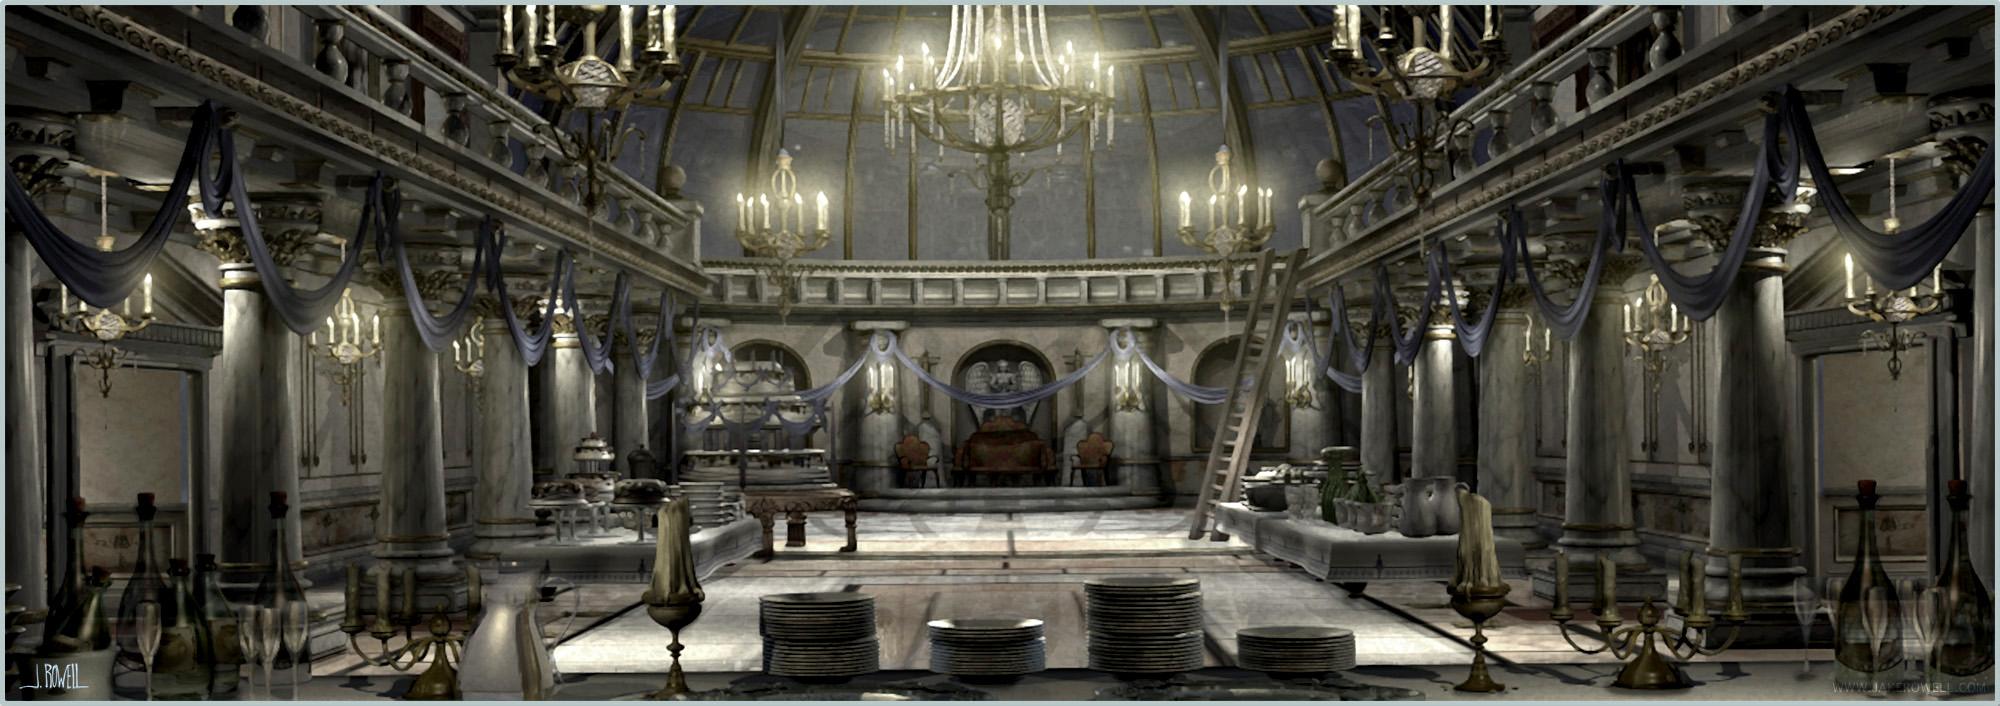 3d Horror Vampire Wallpaper Final Fantasy Ix Castle Inside Art Jake L Rowell